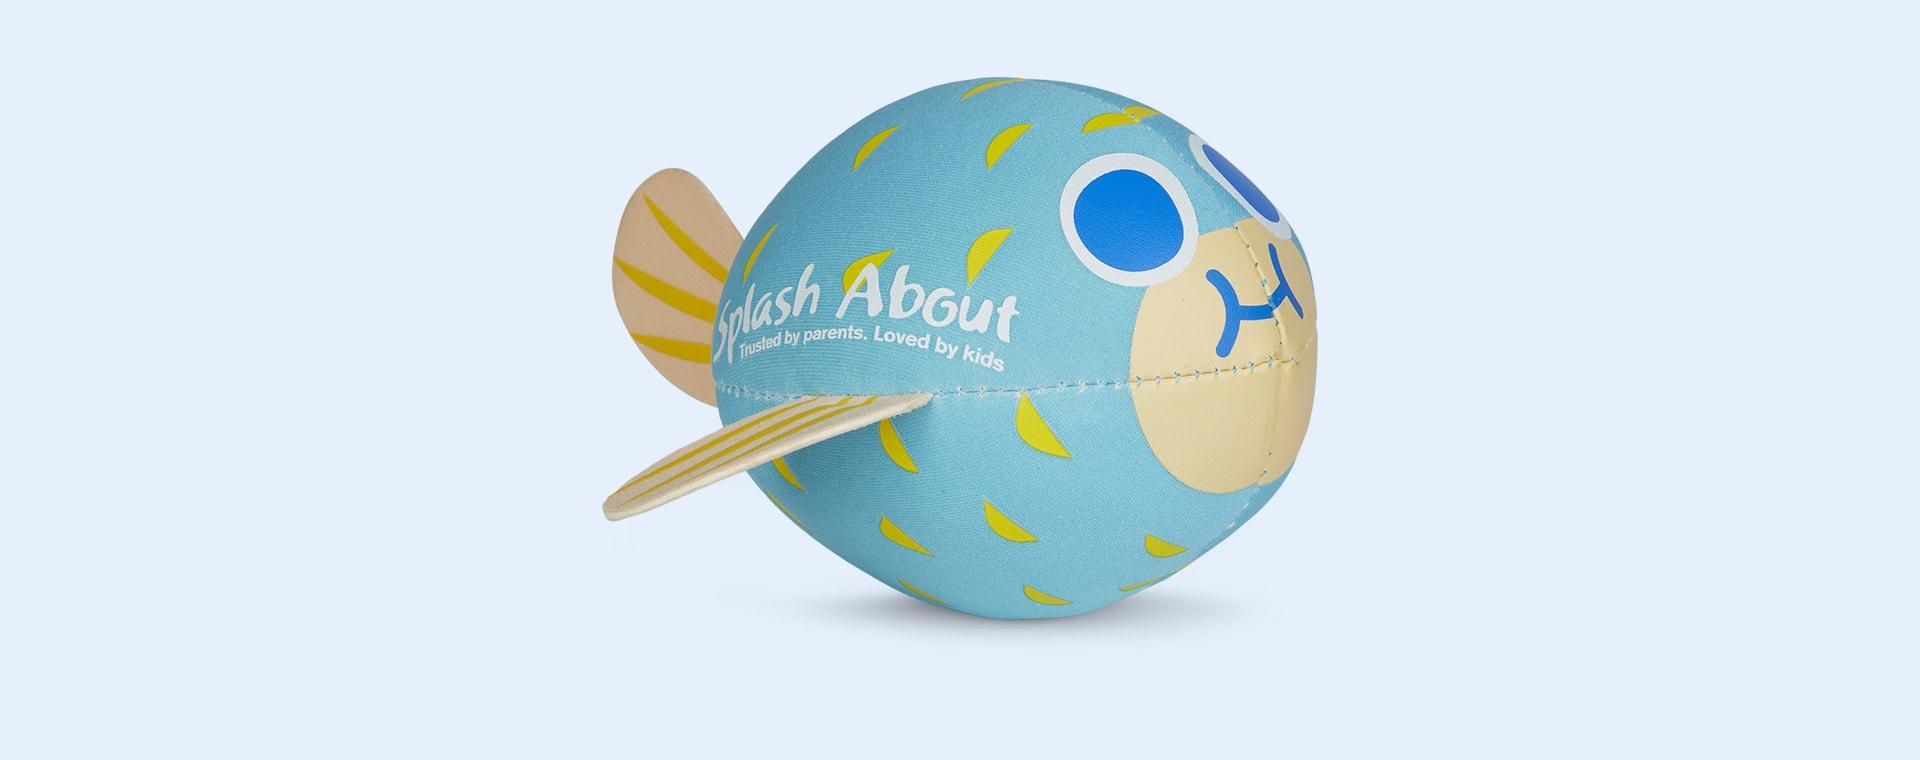 Blue Splash About Neoprene Pufferfish Splash Ball